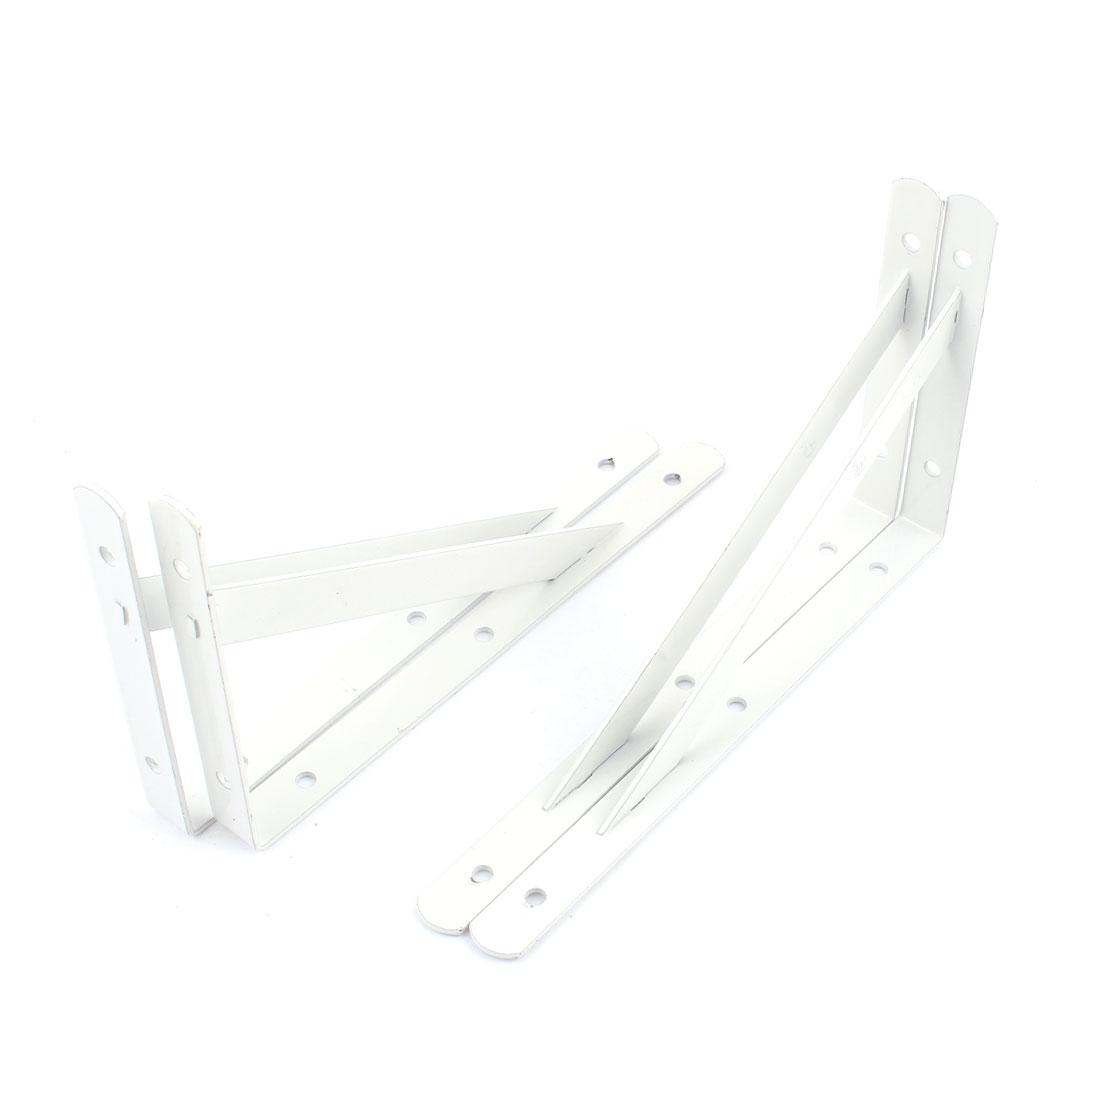 20cm x 12cm White L Shaped Book Goods Holder Shelf Bracket Support 4 Pcs